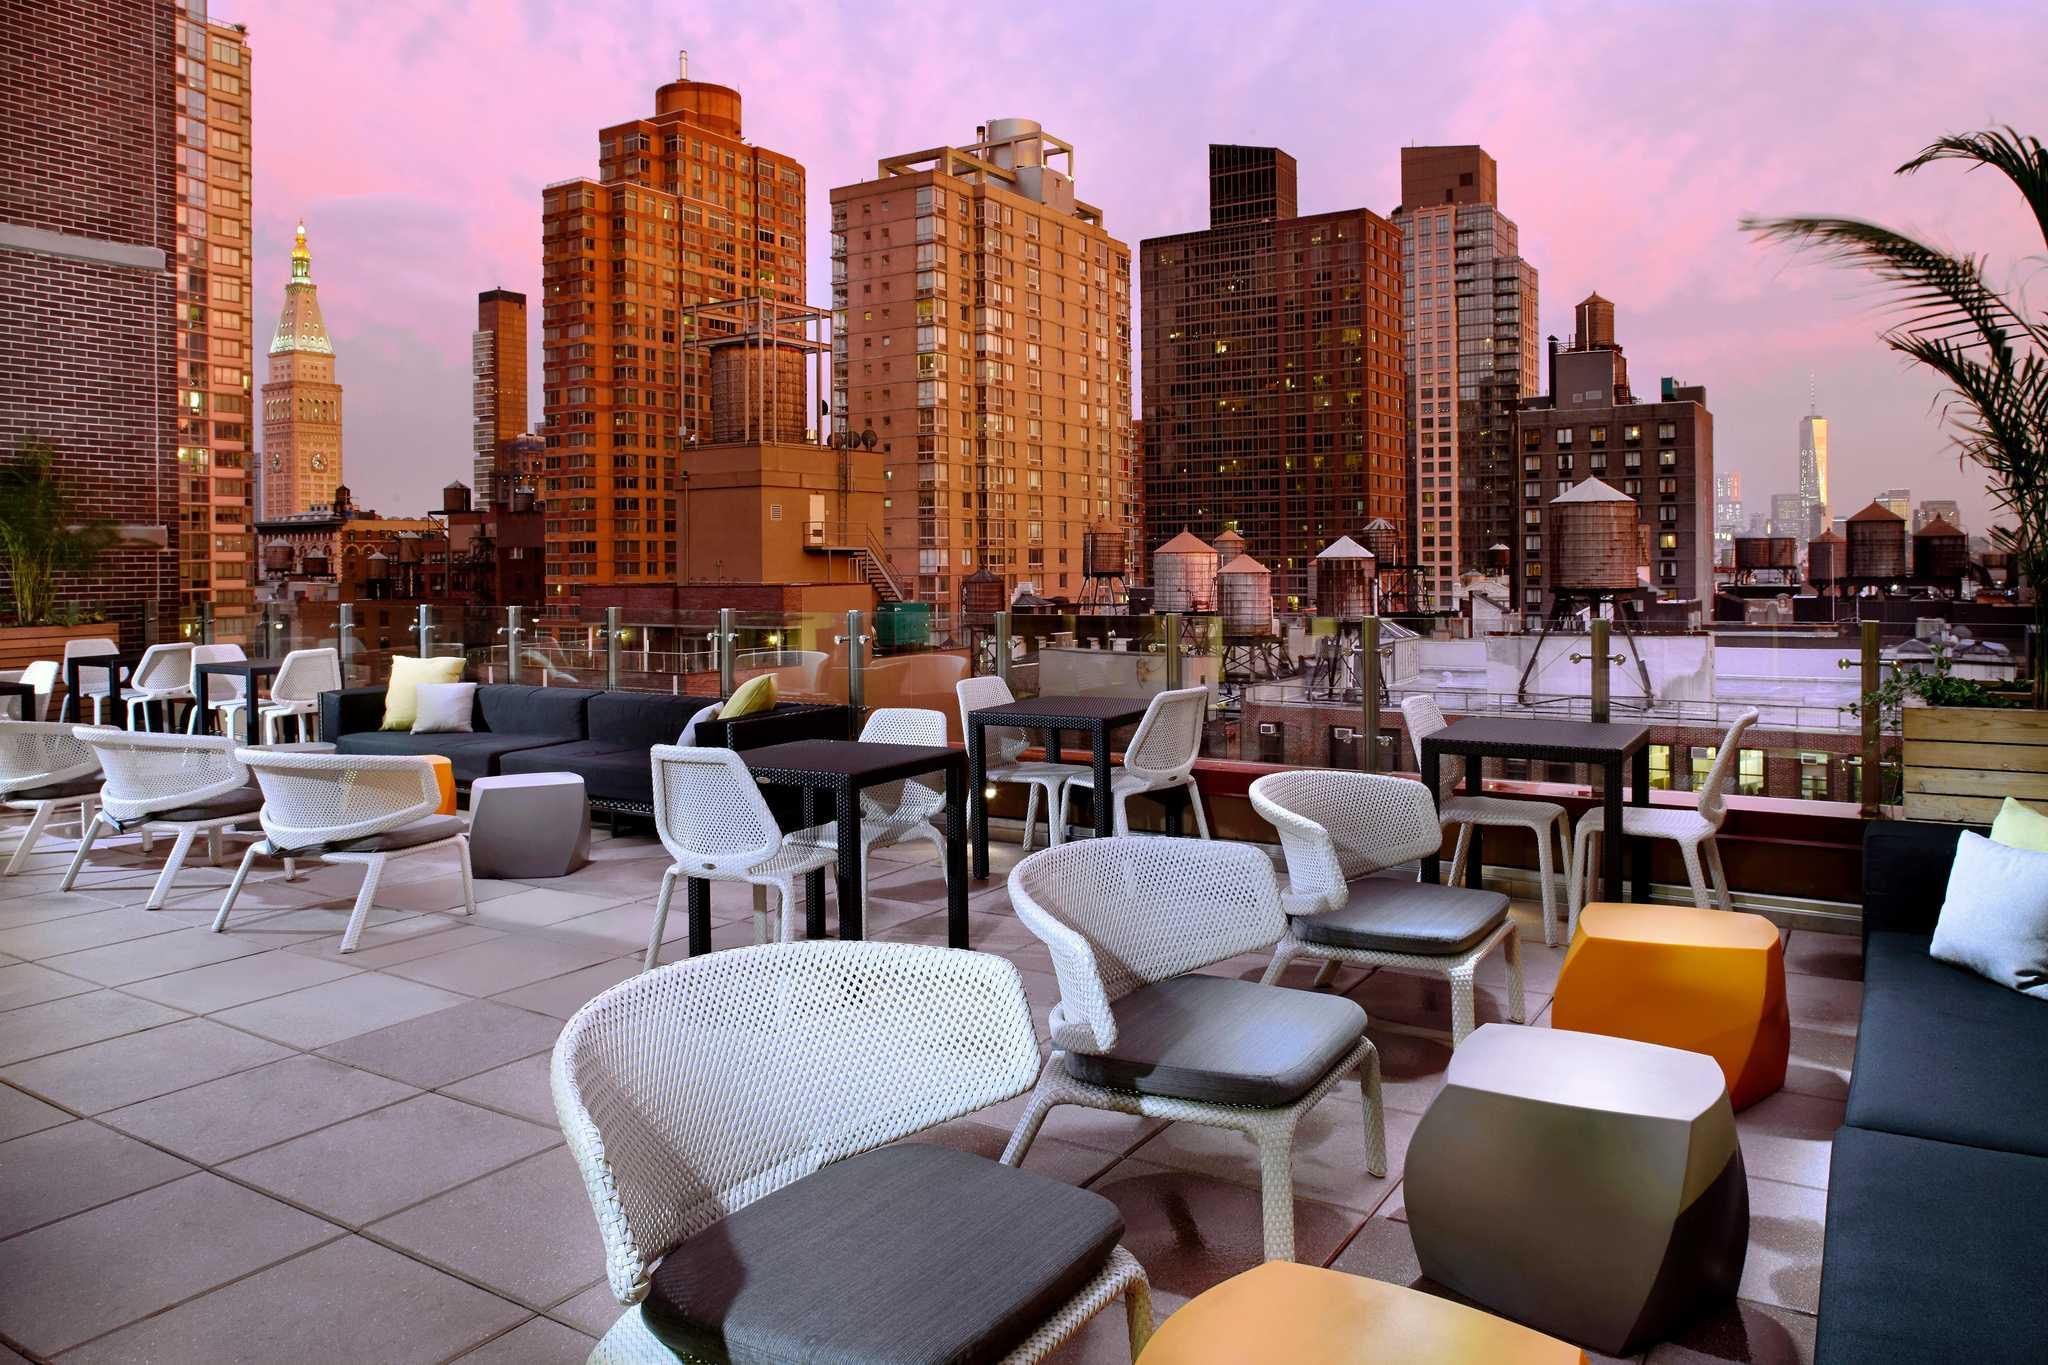 New York Internet Cafe Manhattan